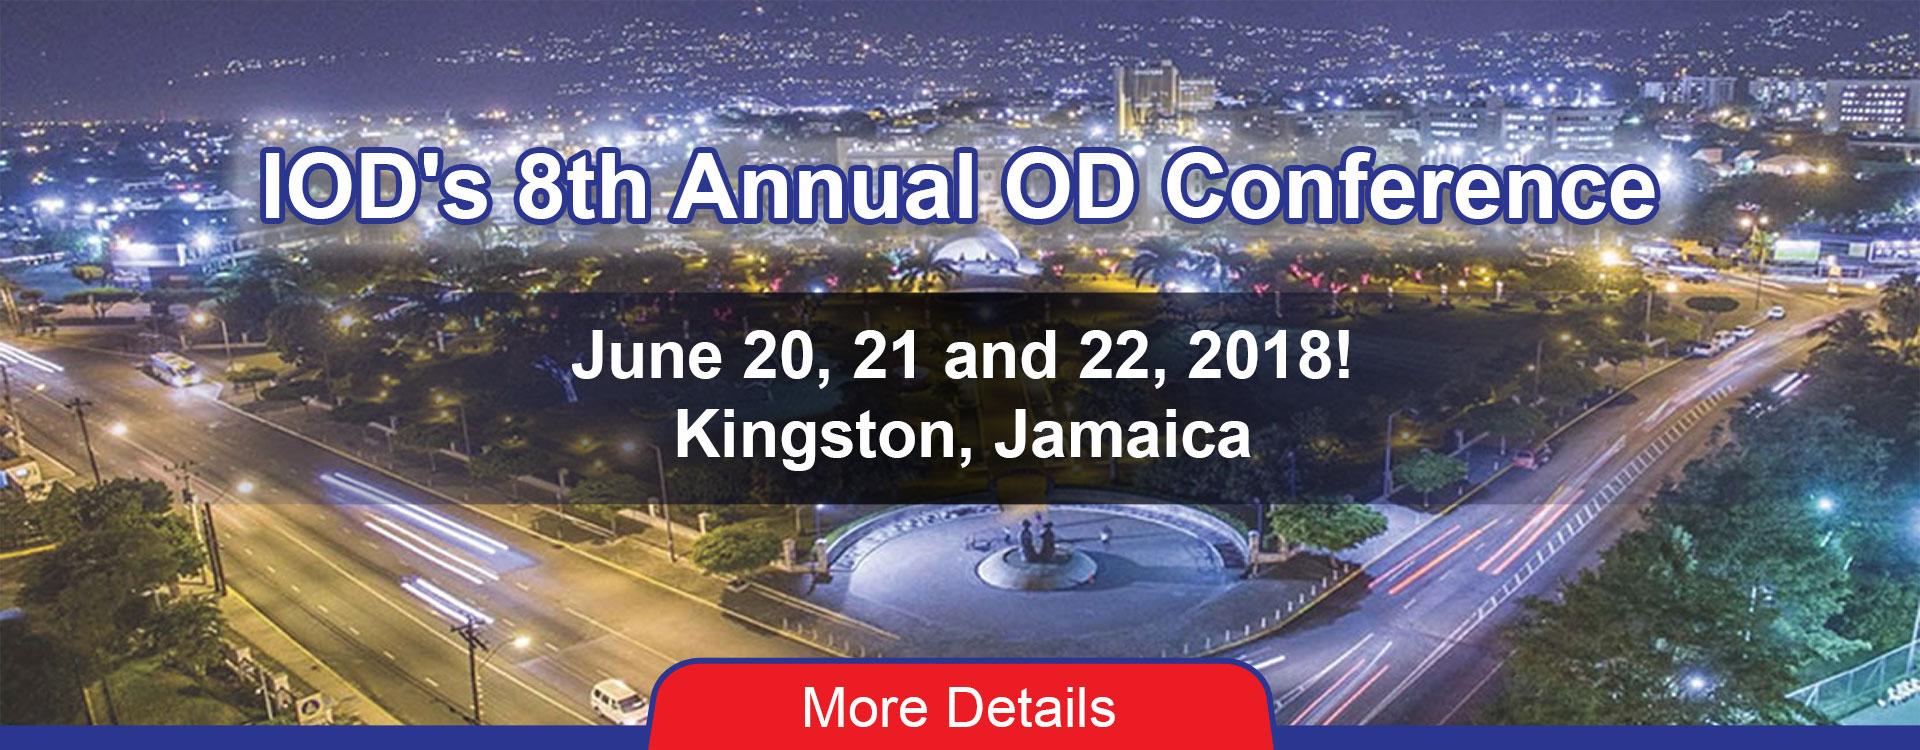 IOD's 8th Annual Conference 2018